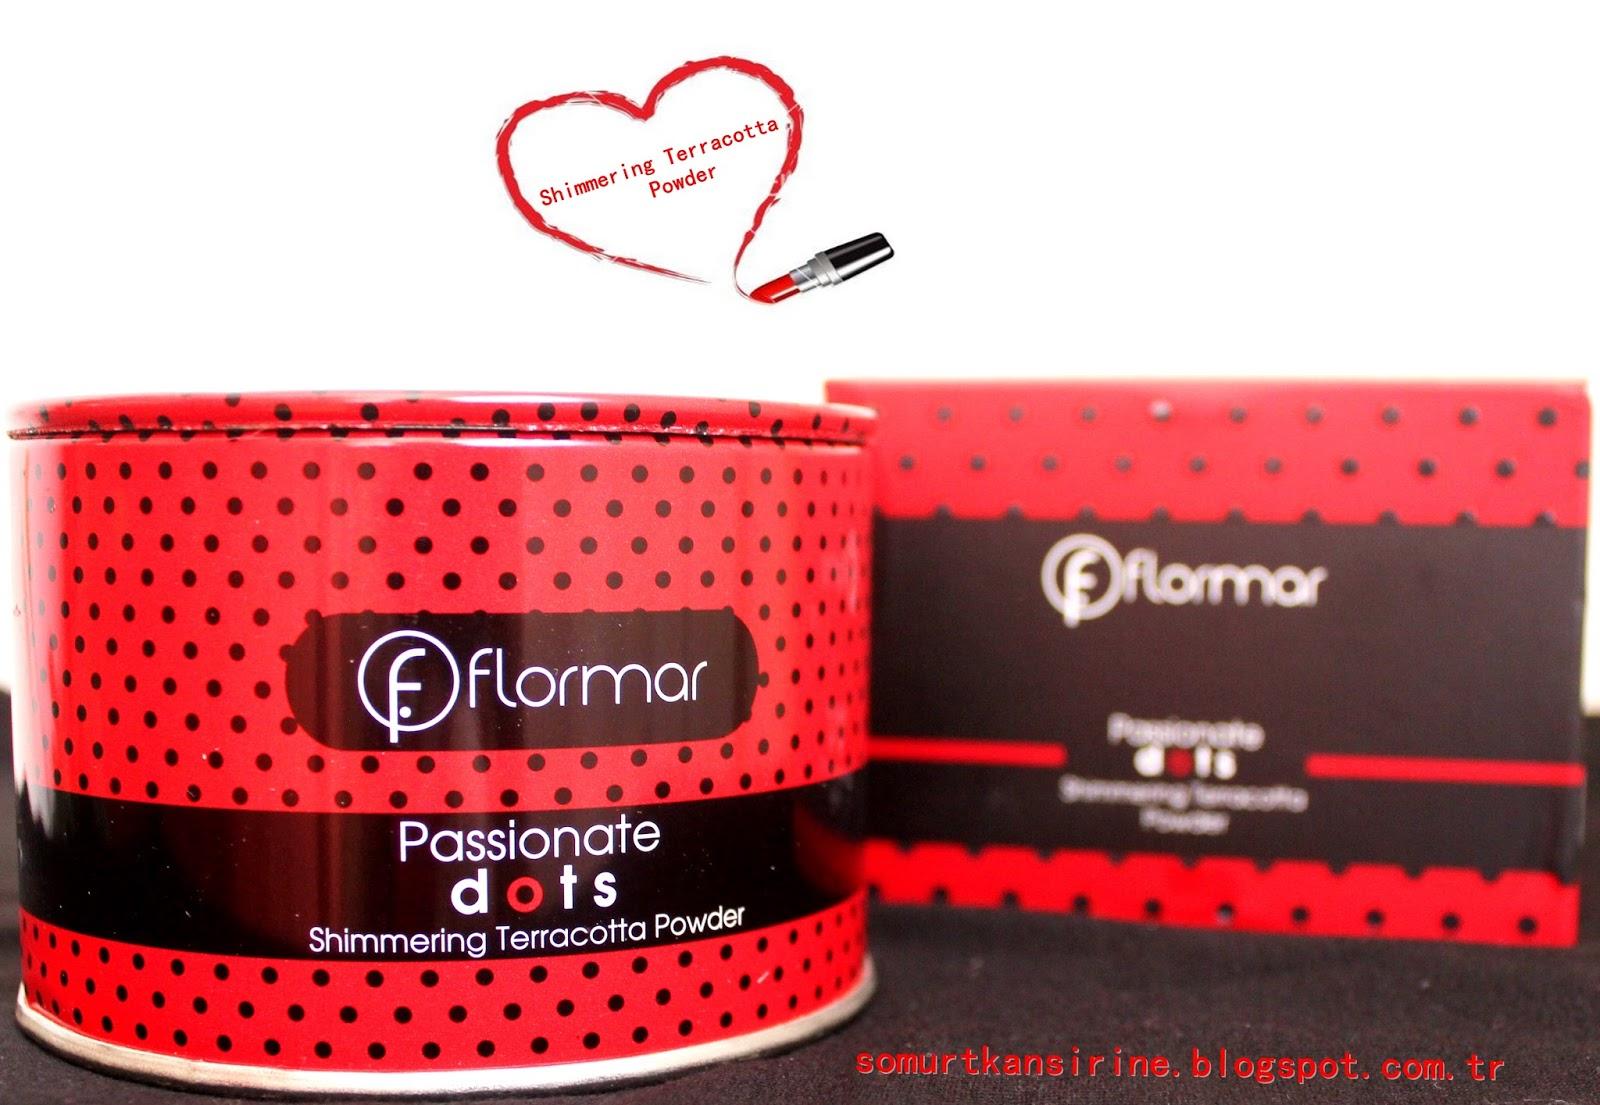 Flormar Passionate Dots Terracotta